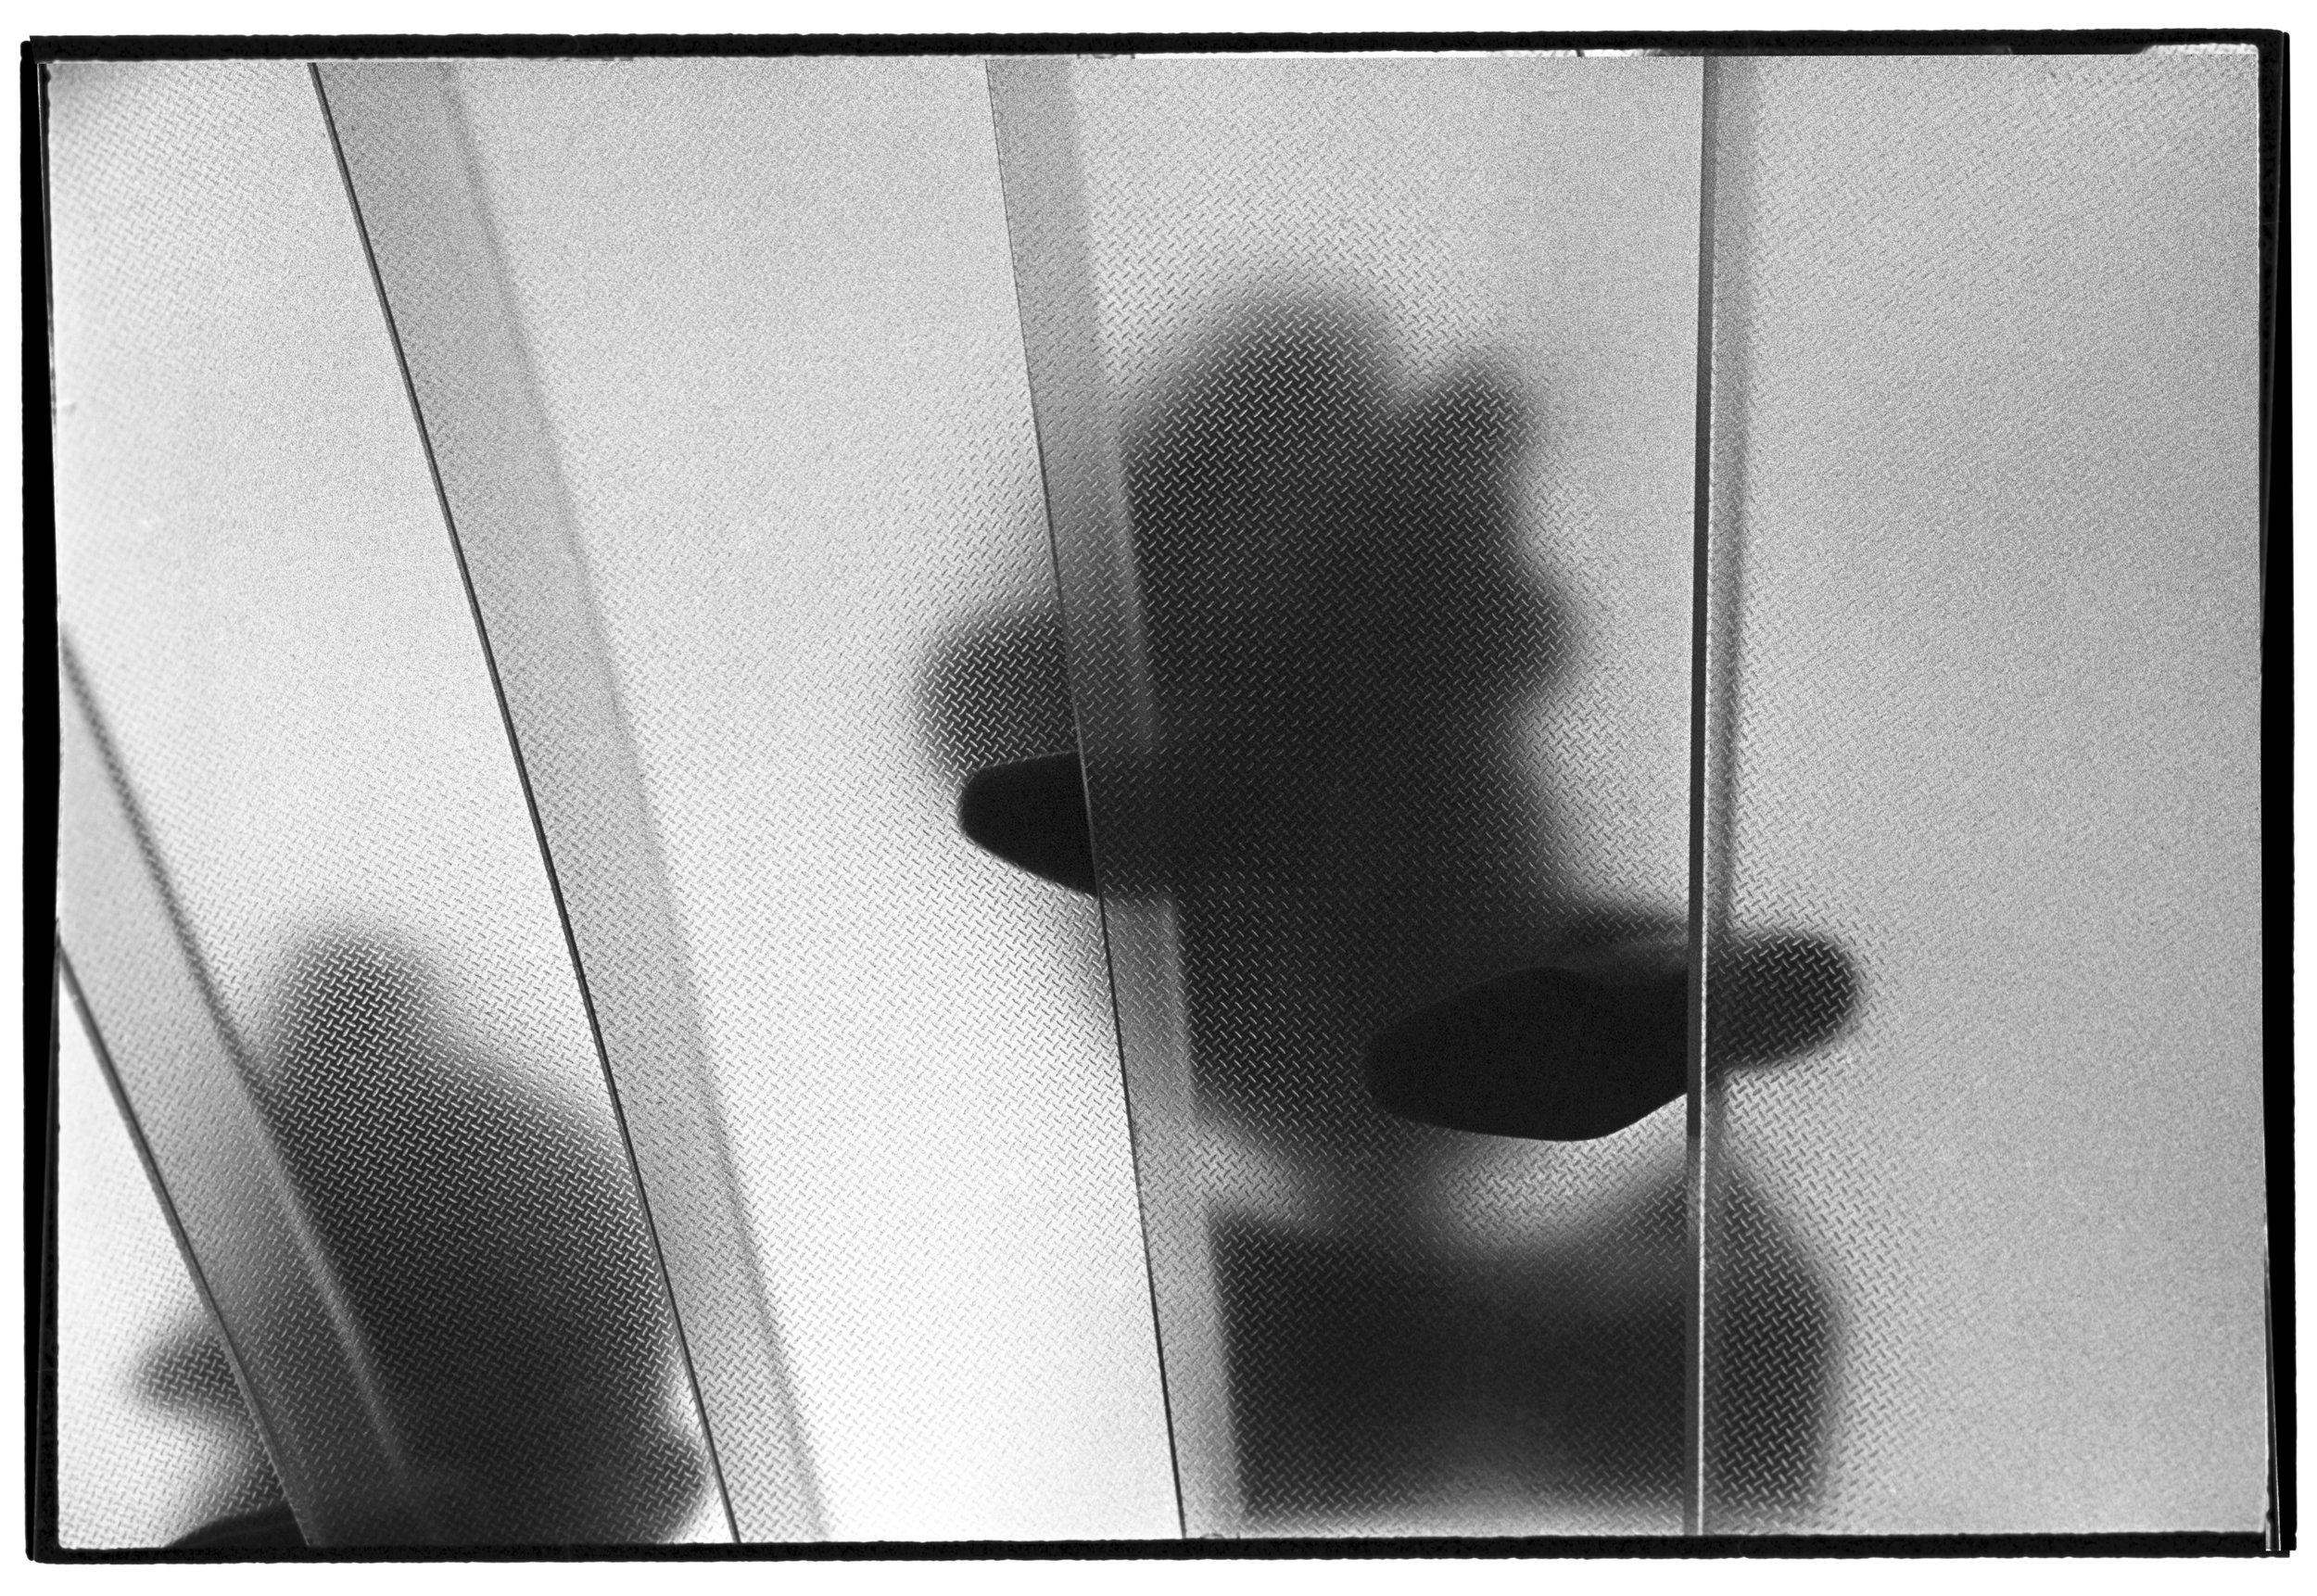 Underfoot_08.jpg